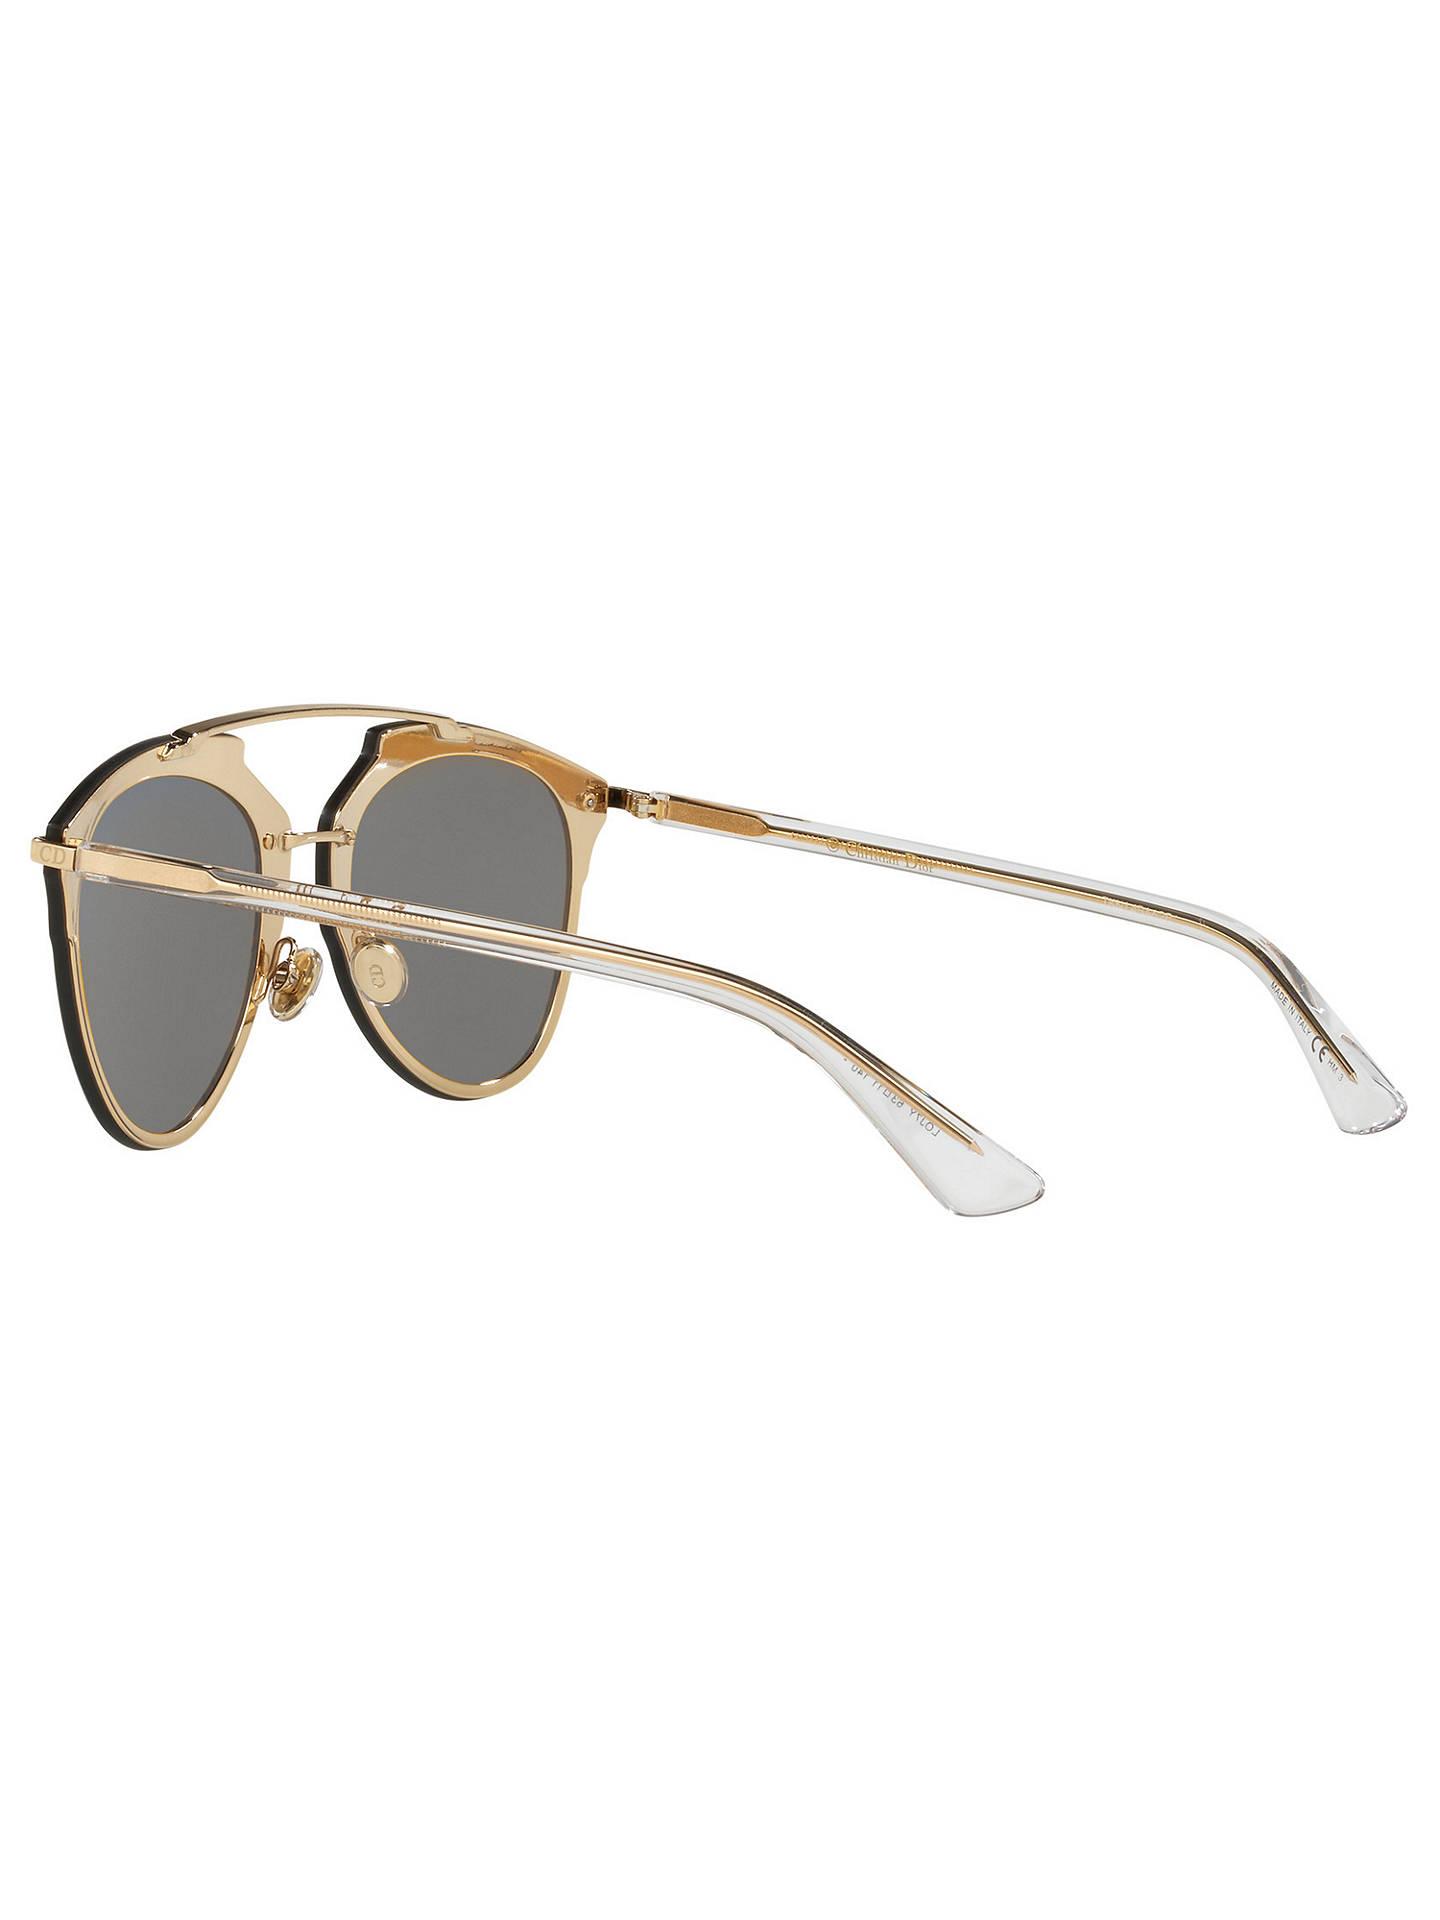 61d7d01591 Buy Christian Dior J Adior Oval Sunglasses